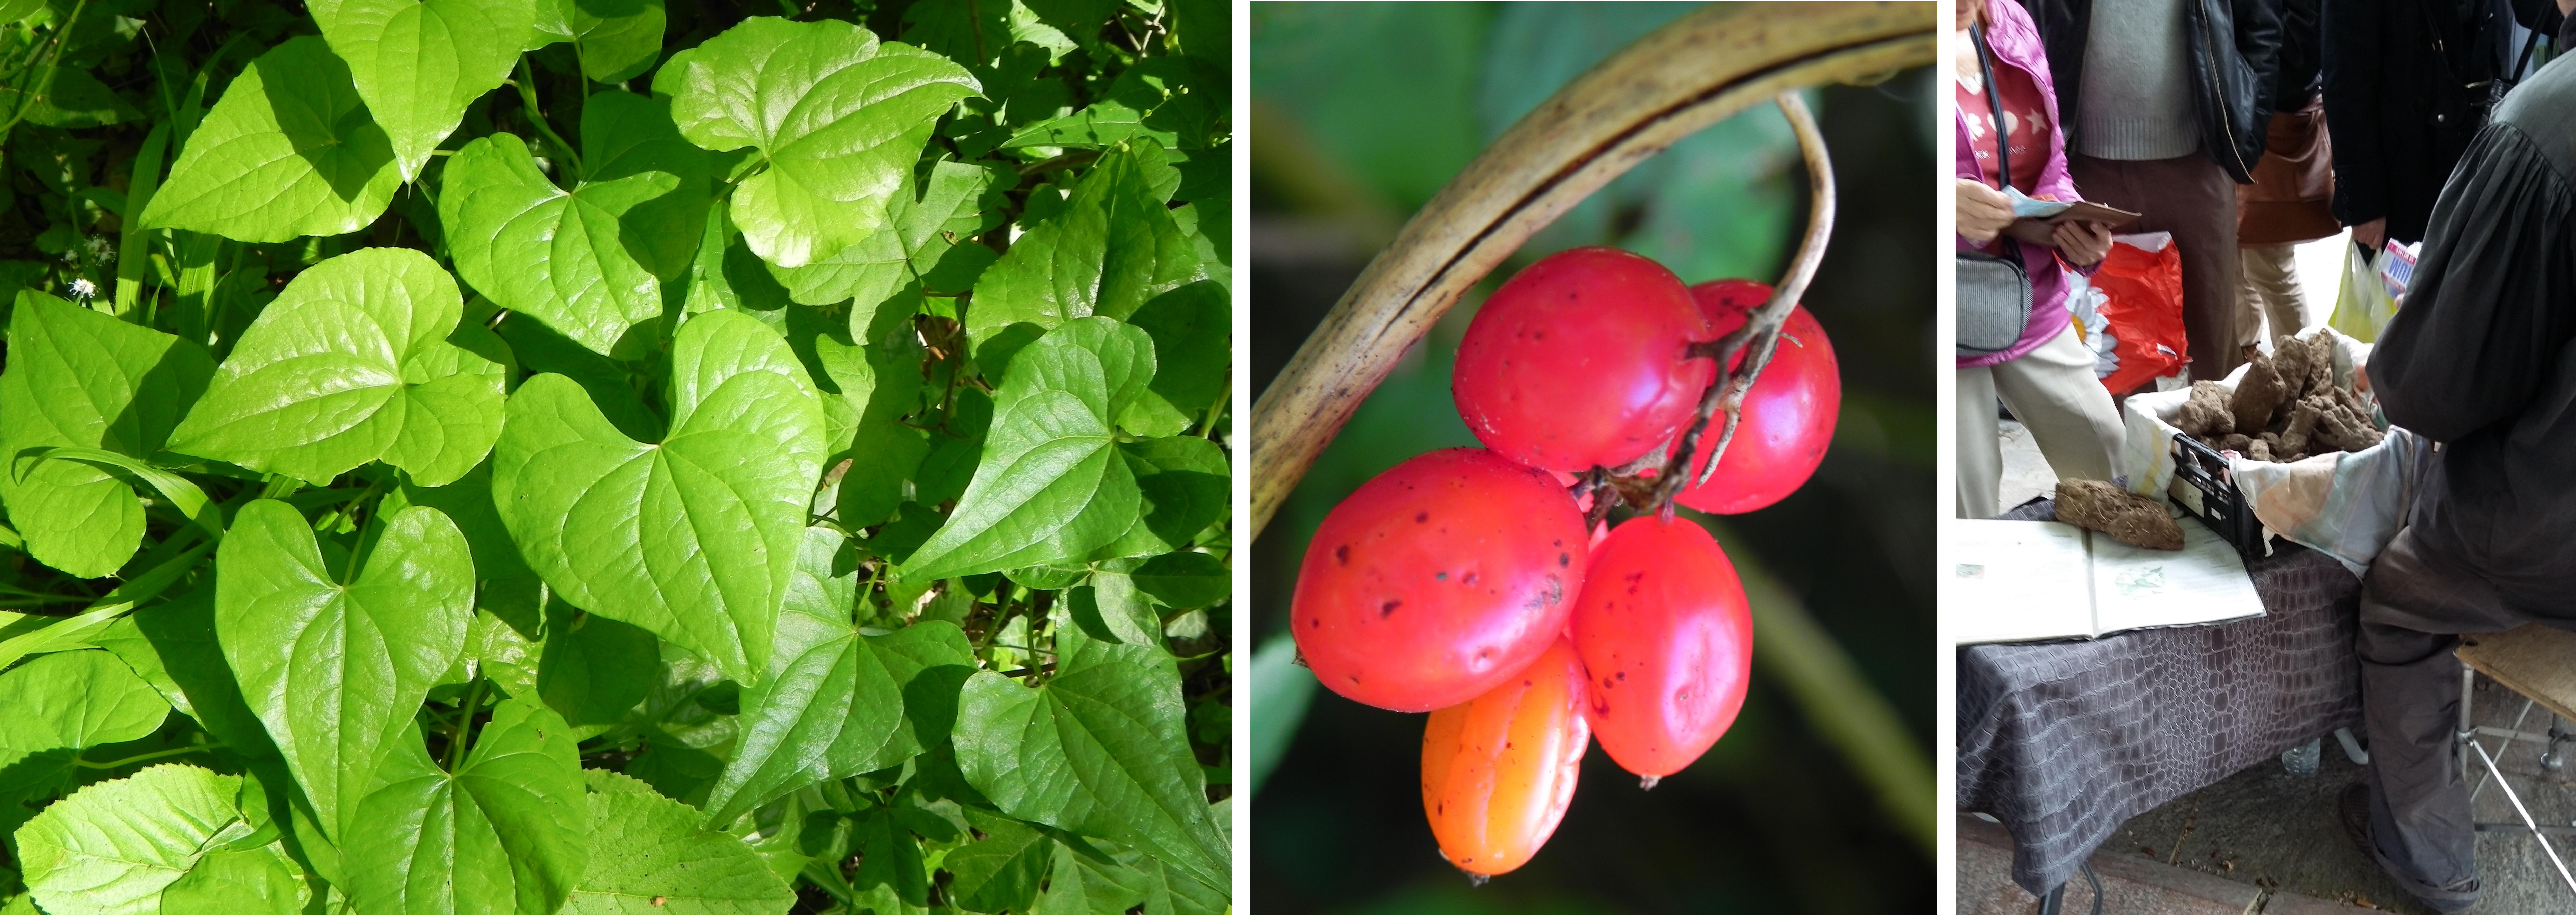 Dioscorea communis, le tamier